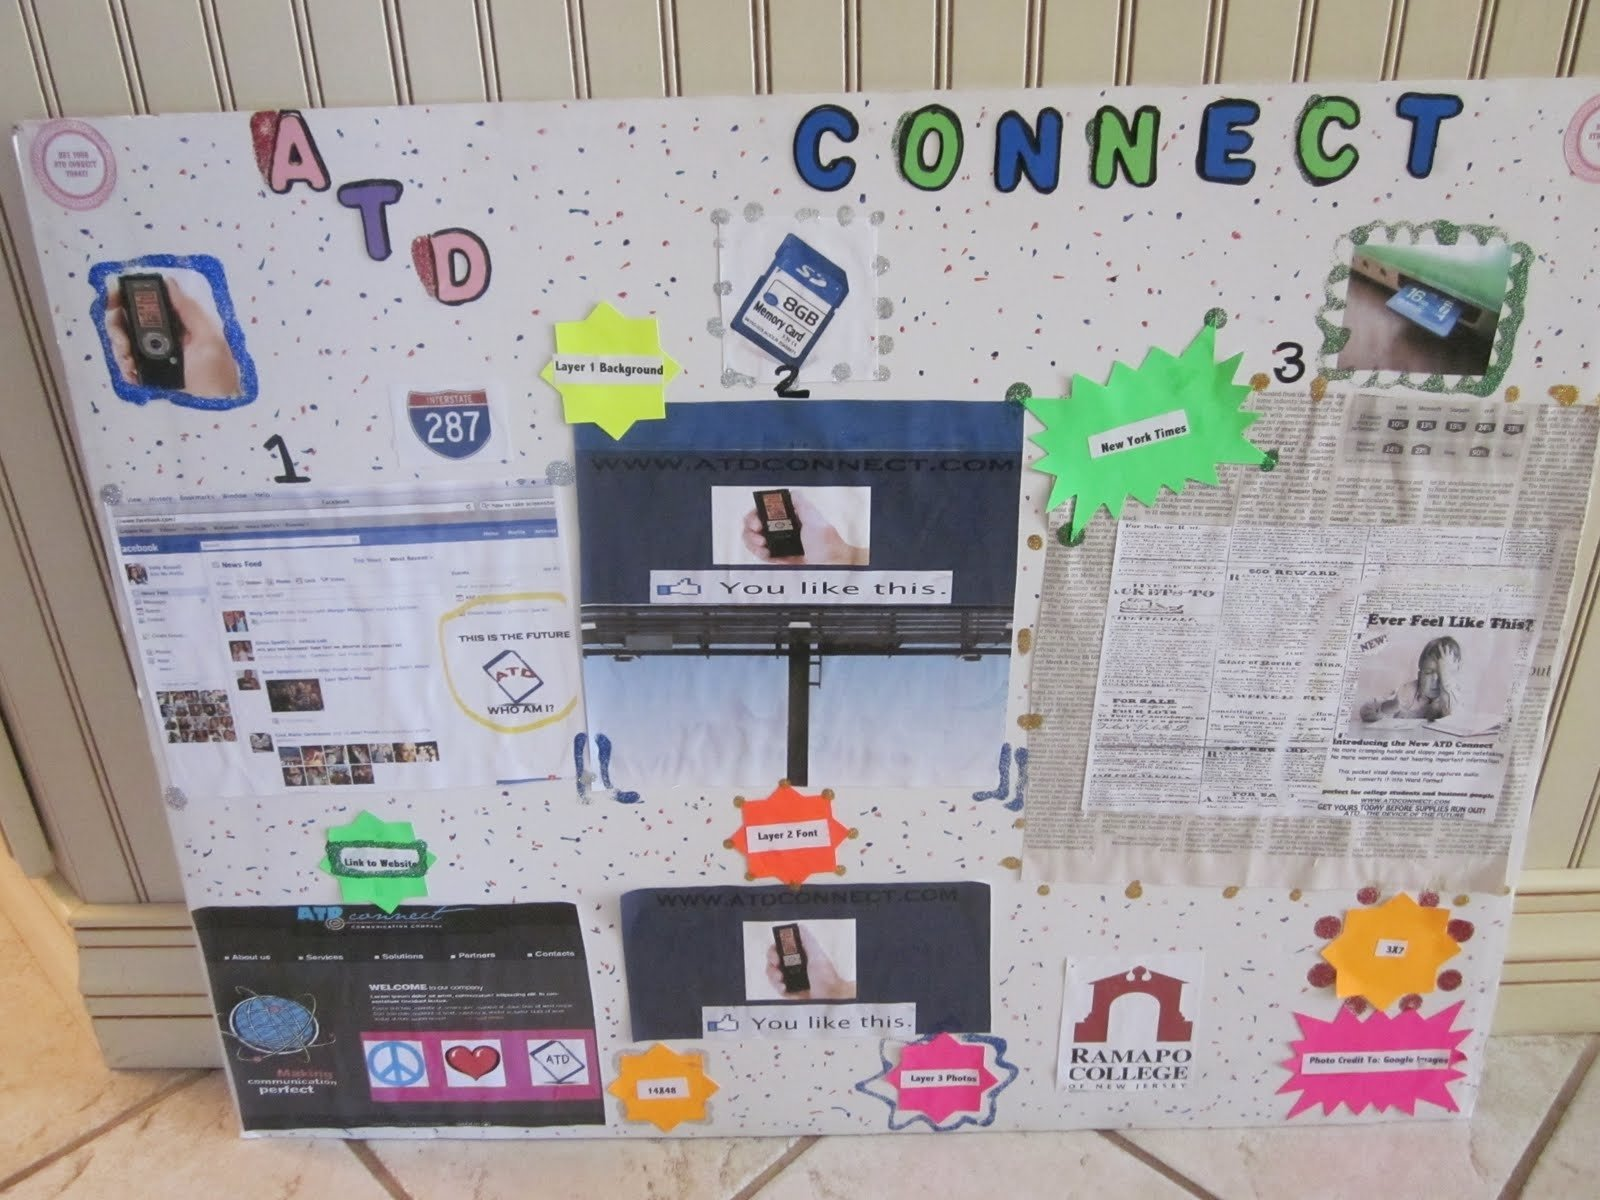 10 Best Poster Board Ideas For School Projects cool poster board project ideas final dma homes 60871 2020